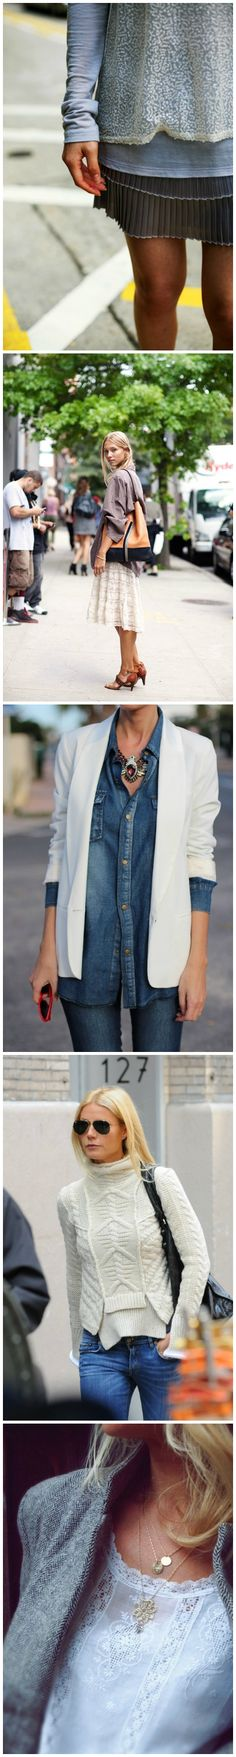 #   women fashion #2dayslook #new #fashion #nice  www.2dayslook.com